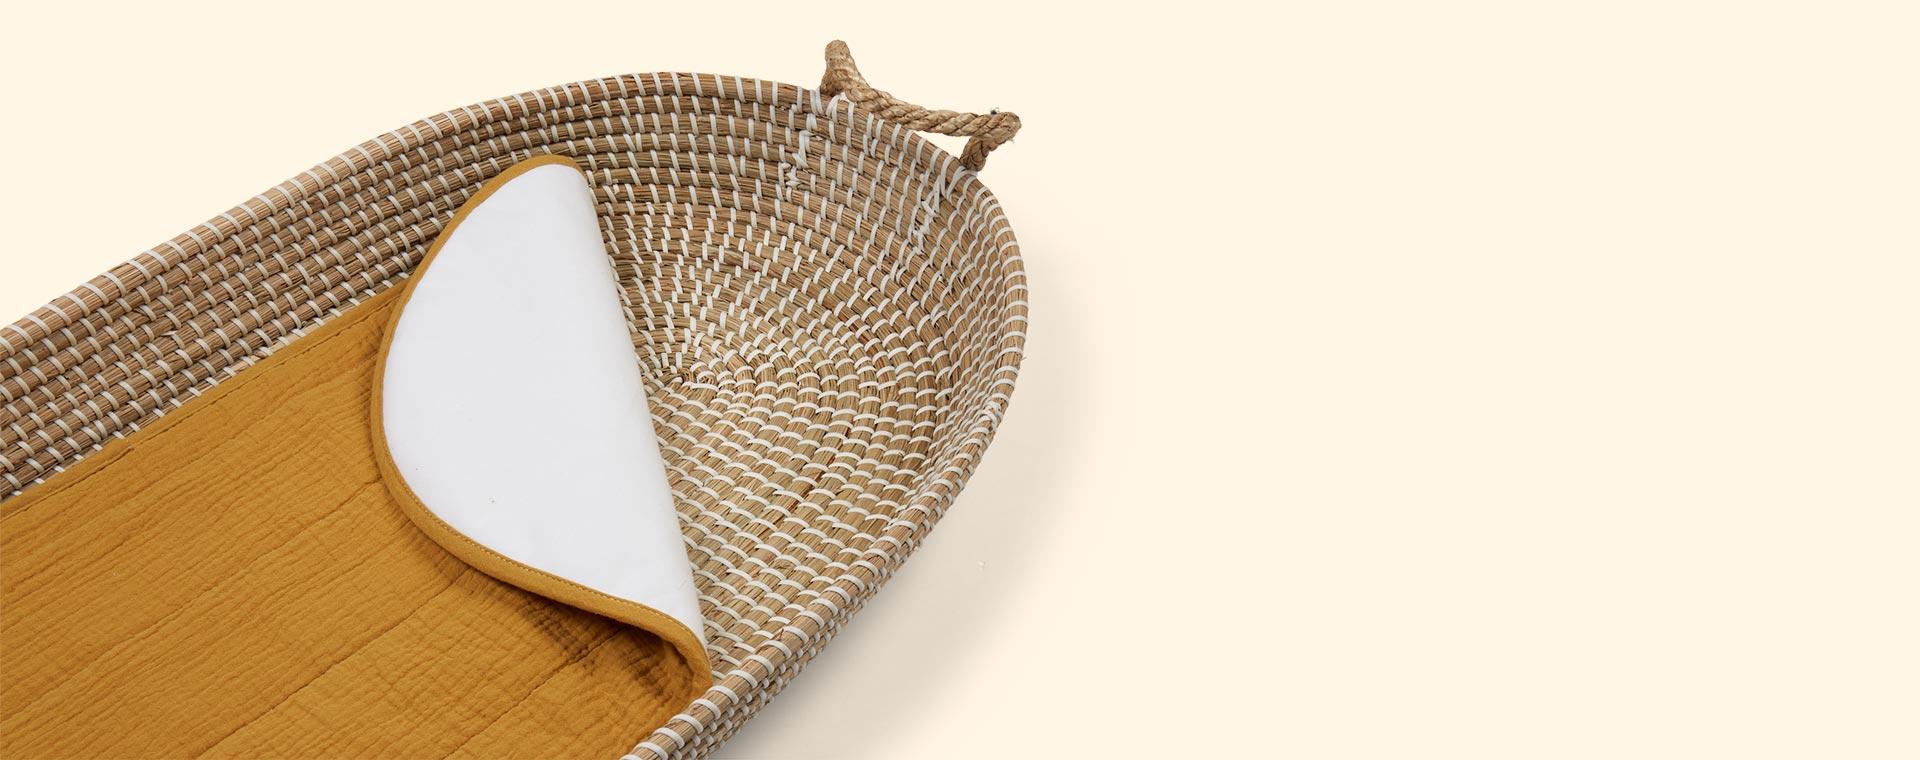 Mustard Olli Ella Changing Basket Cotton Insert - Luxury